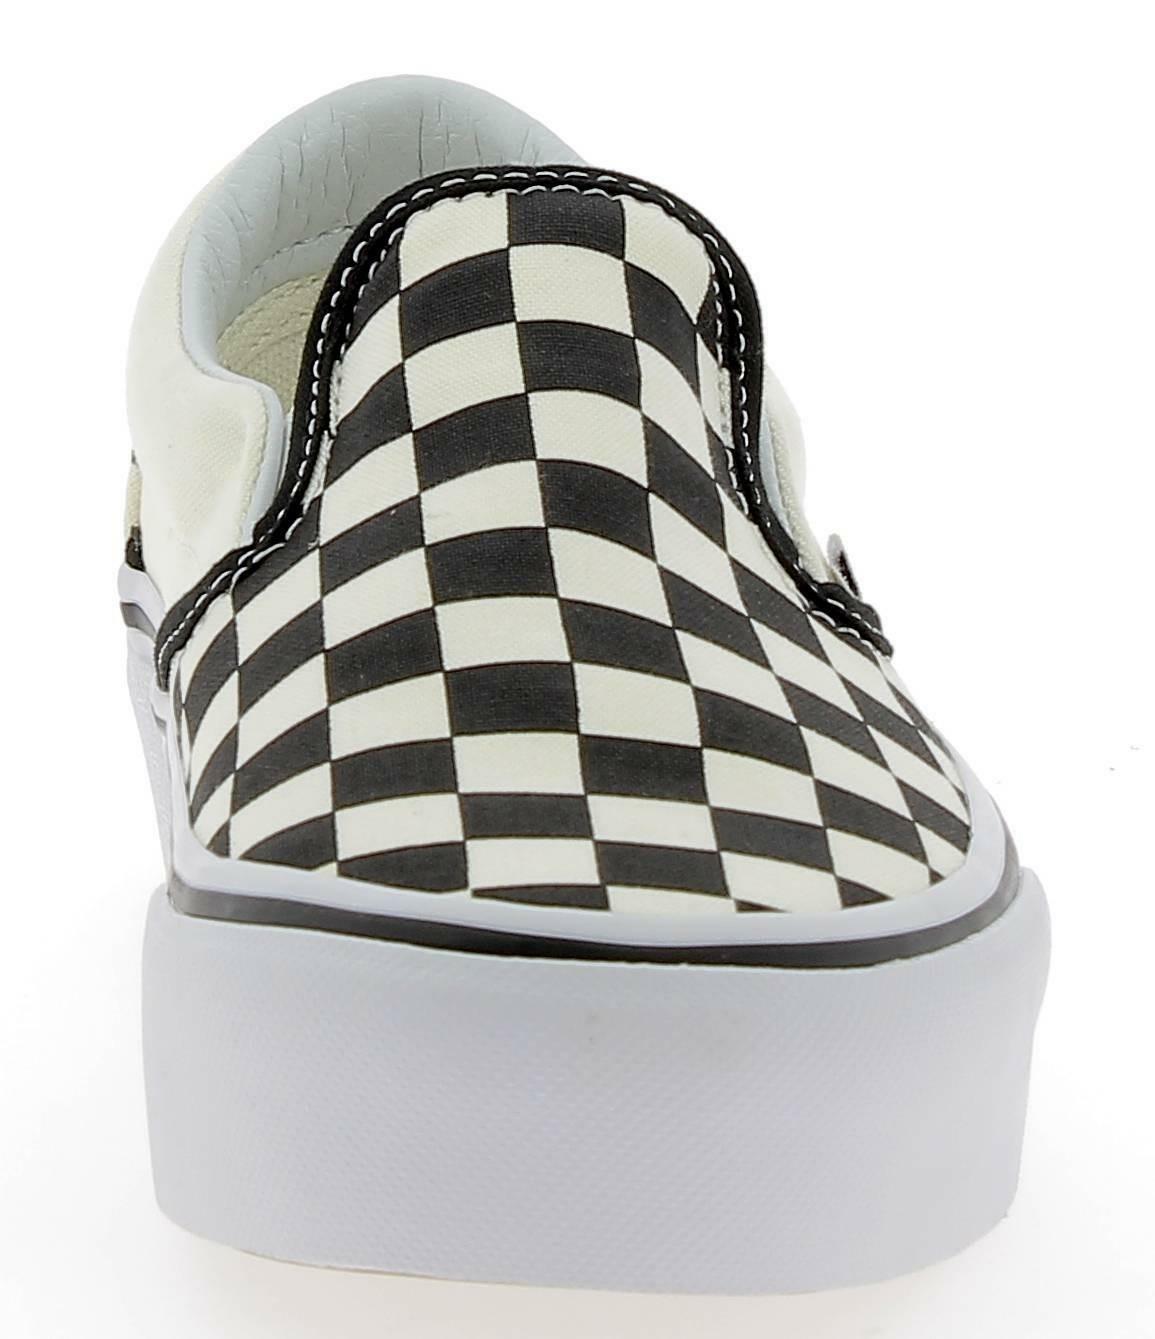 vans vans classic slip on scarpe sportive nere bianche